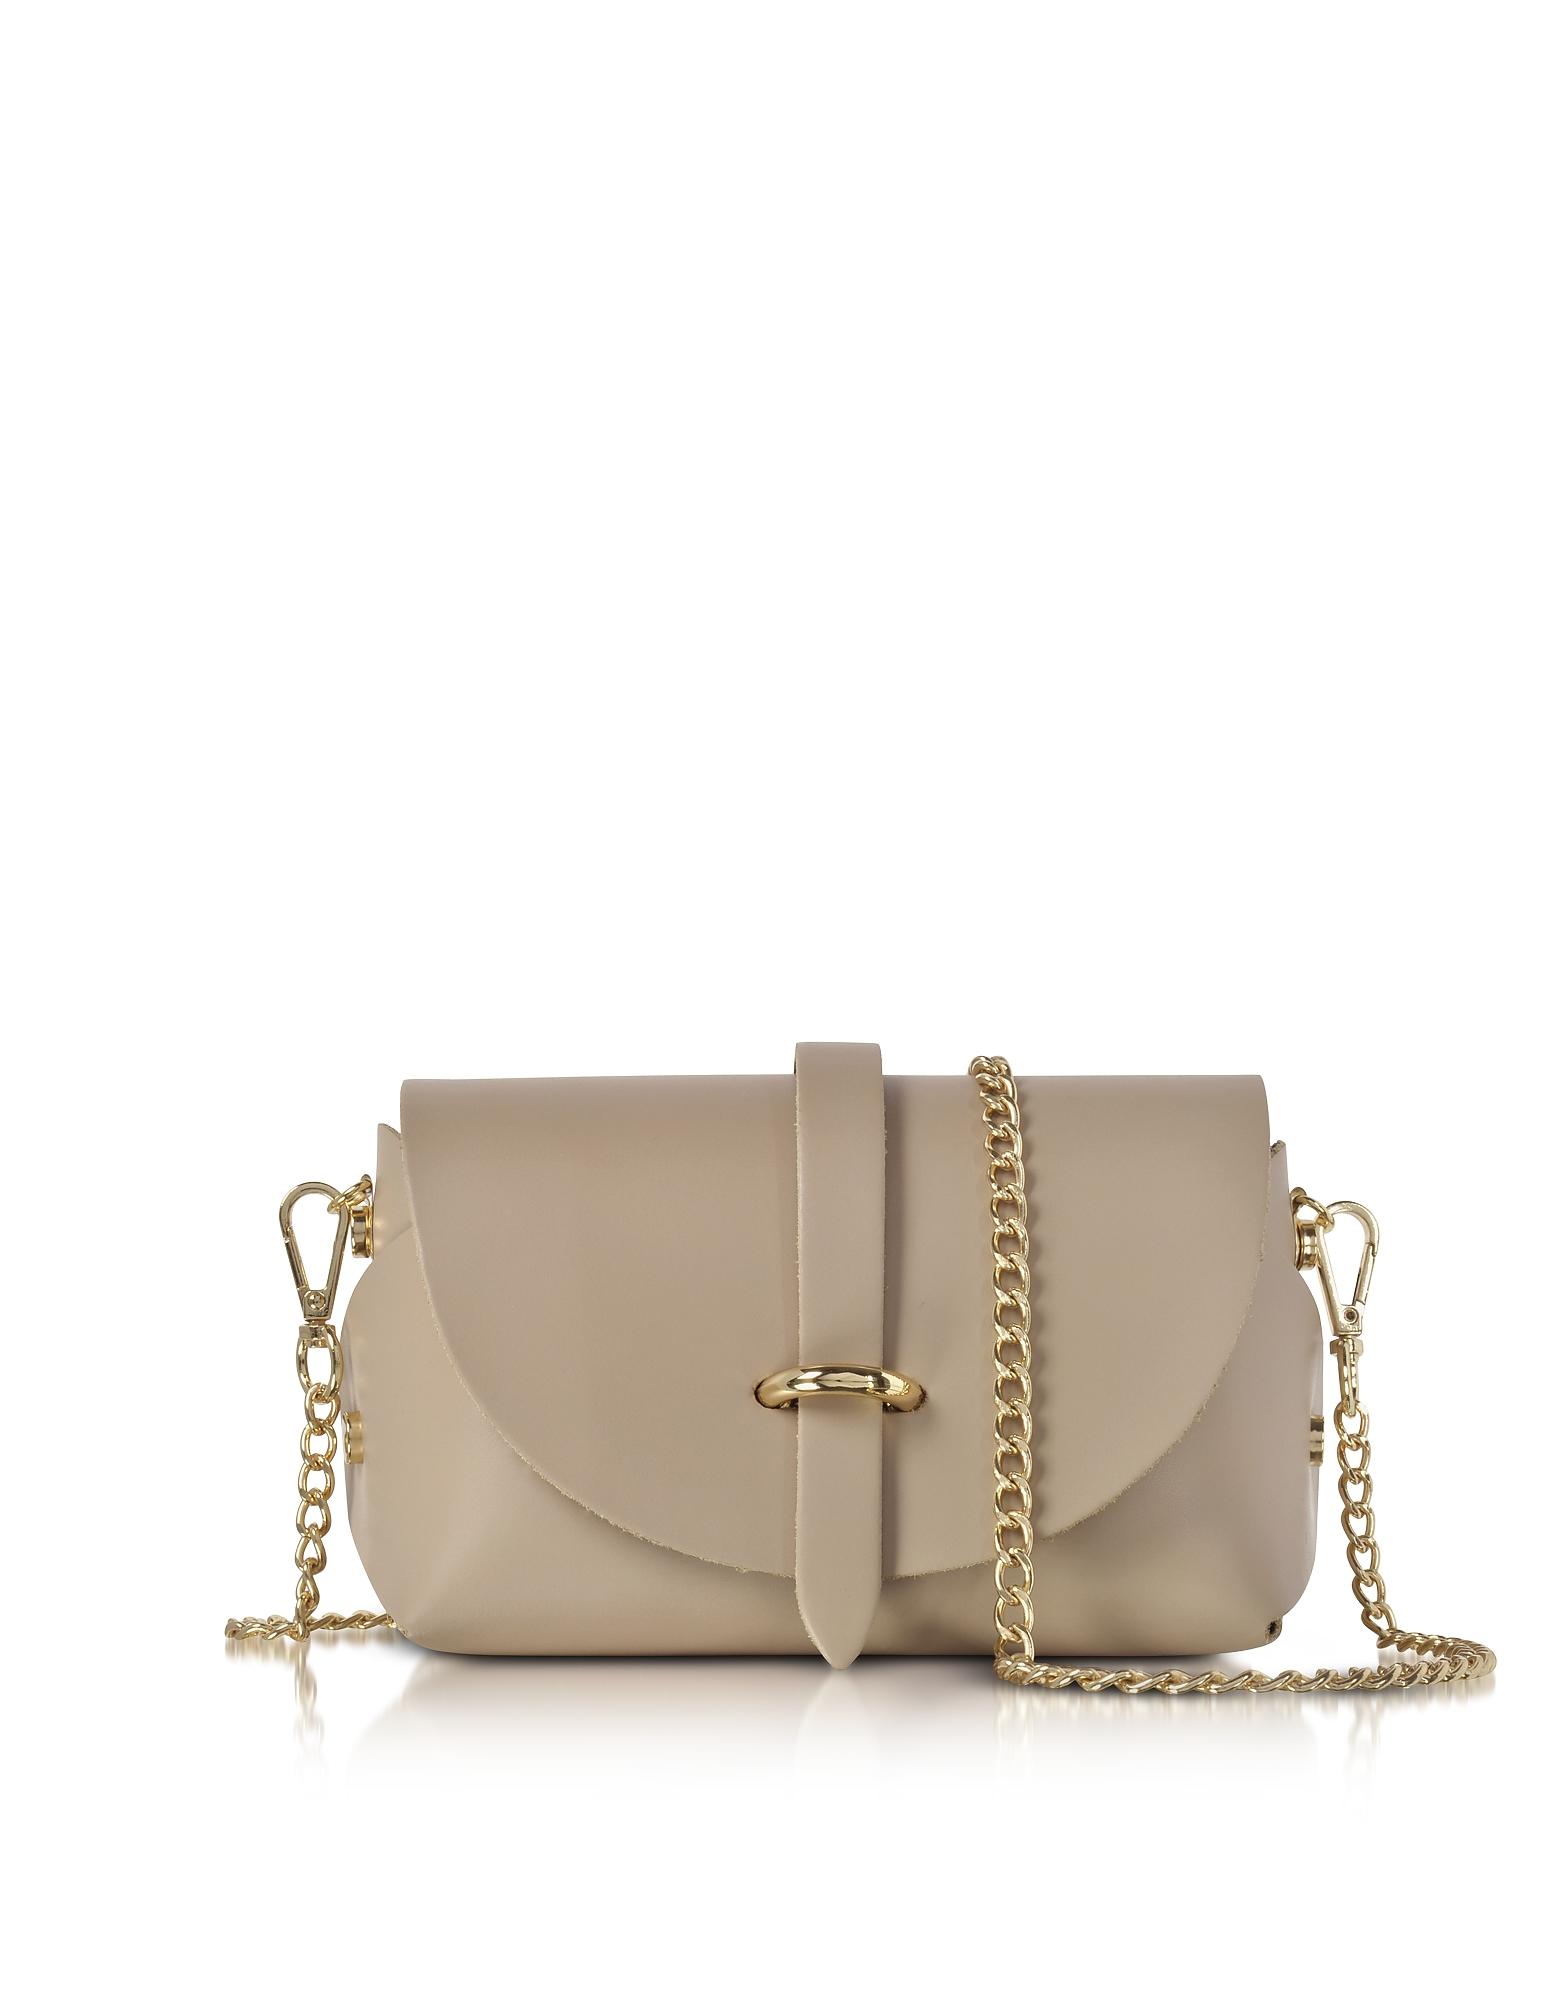 Le Parmentier Handbags, Caviar Nude Leather Mini Shoulder Bag